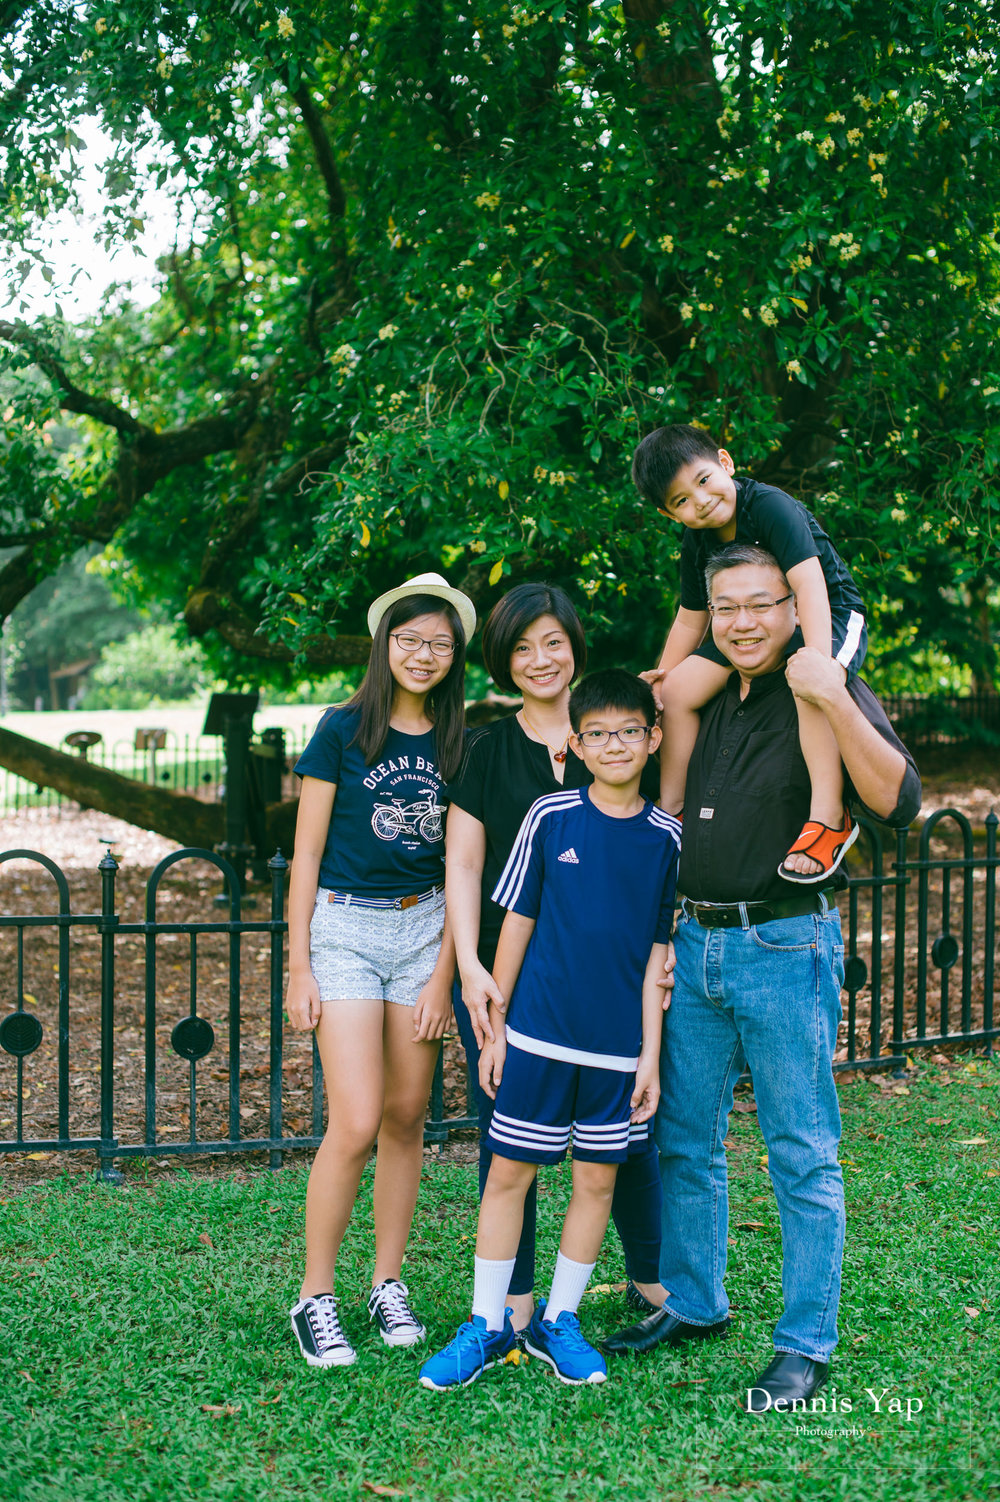 mai yin family portrait singapore botanical garden dennis yap photography malaysia-1.jpg